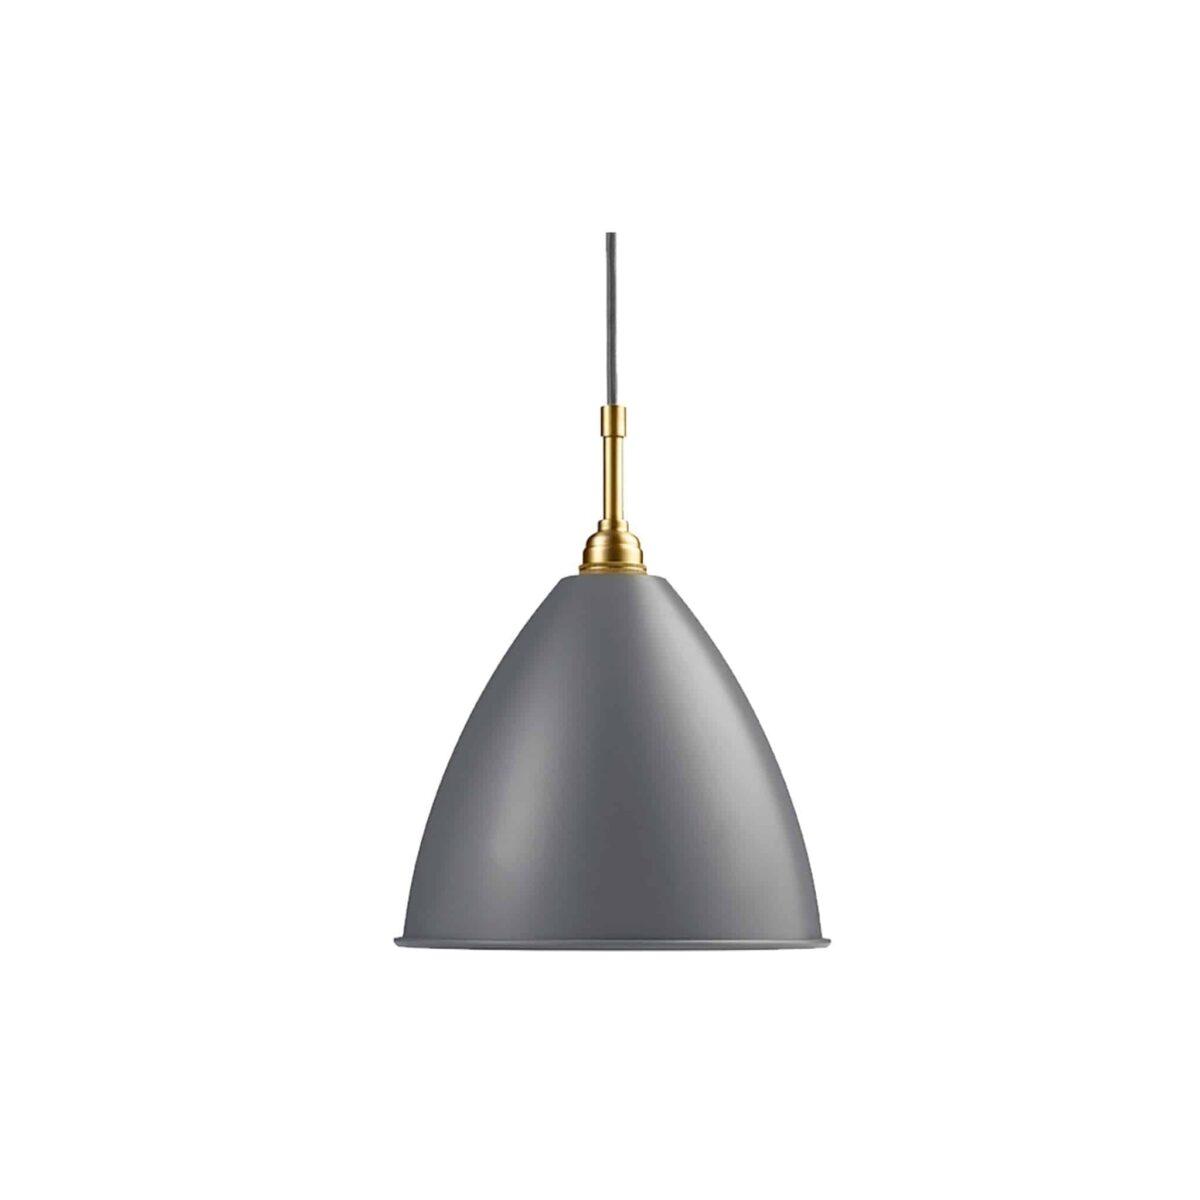 gubi-bestlite-bl9m-pendant-grey-brass-001